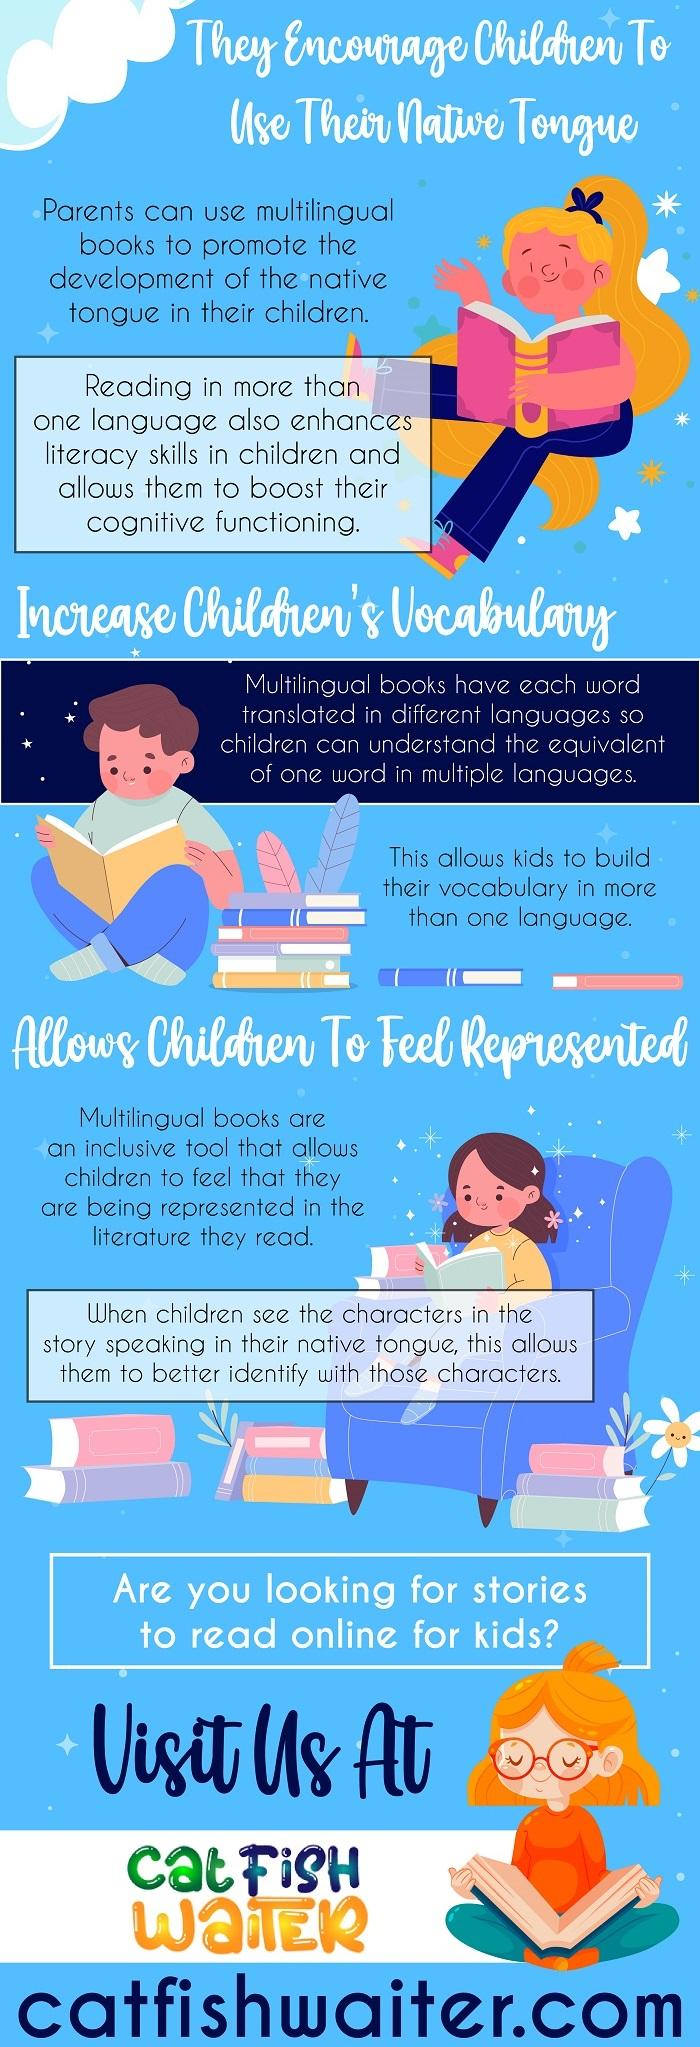 Benefits Of Multilingual Books For Multilingual Chidren